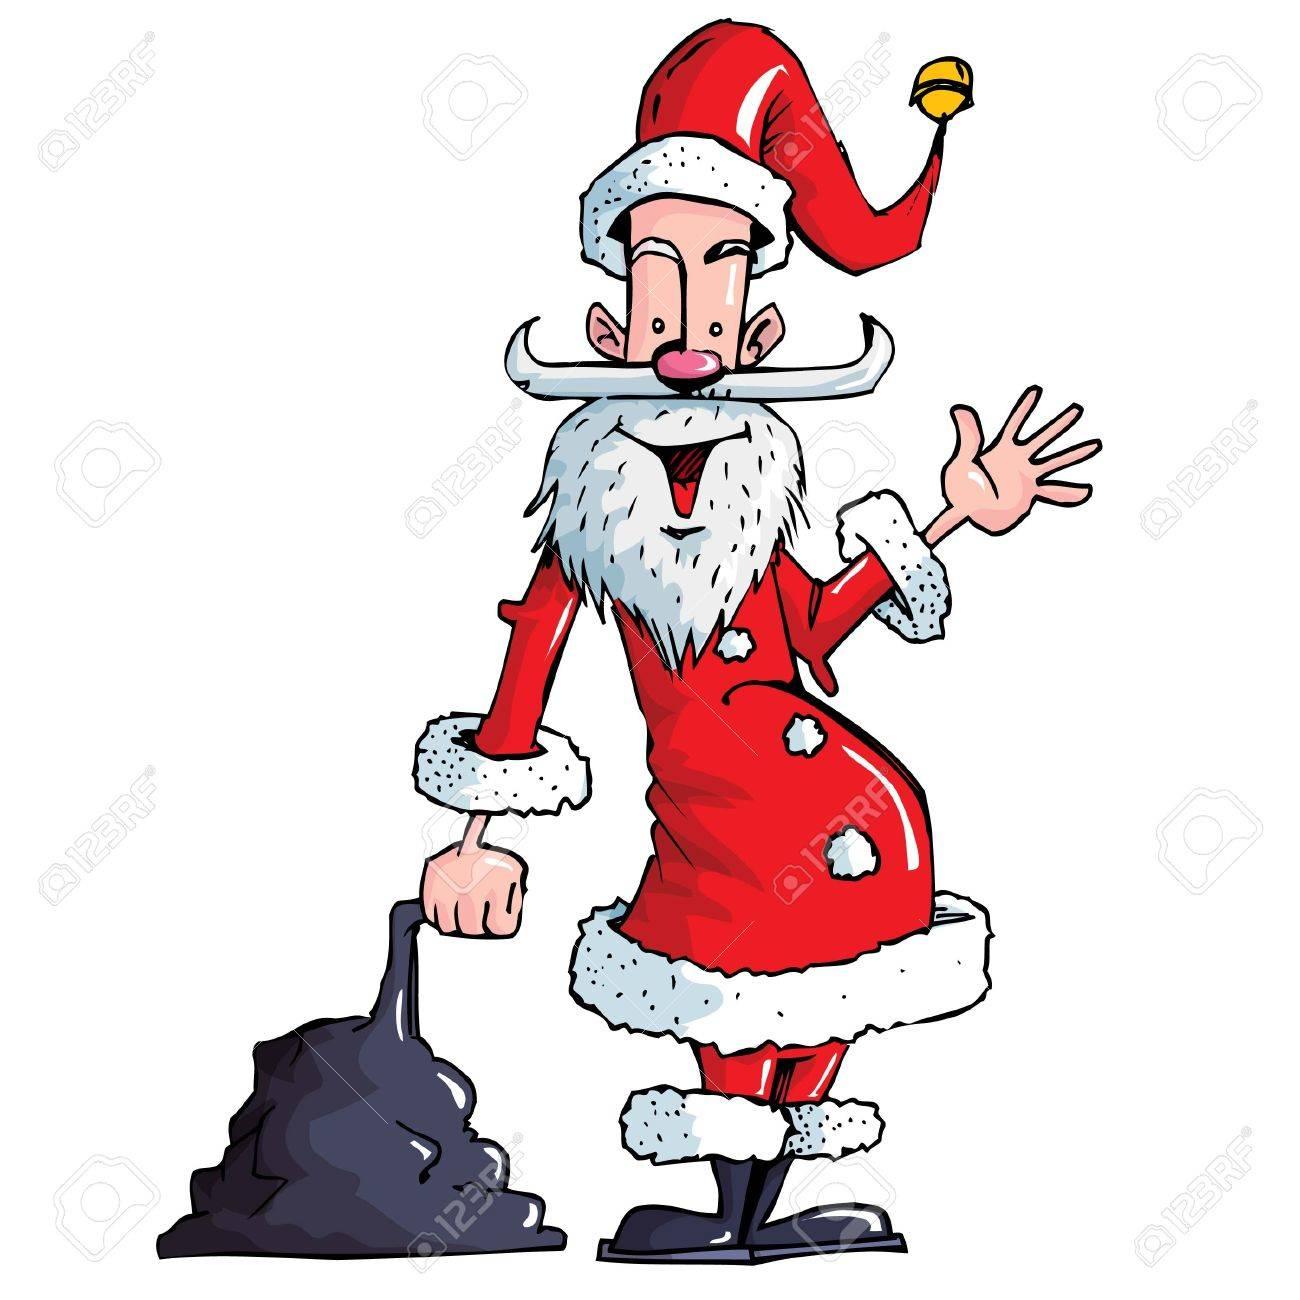 Cartoon Santa with a white beard. Isolated on white Stock Vector - 9376651